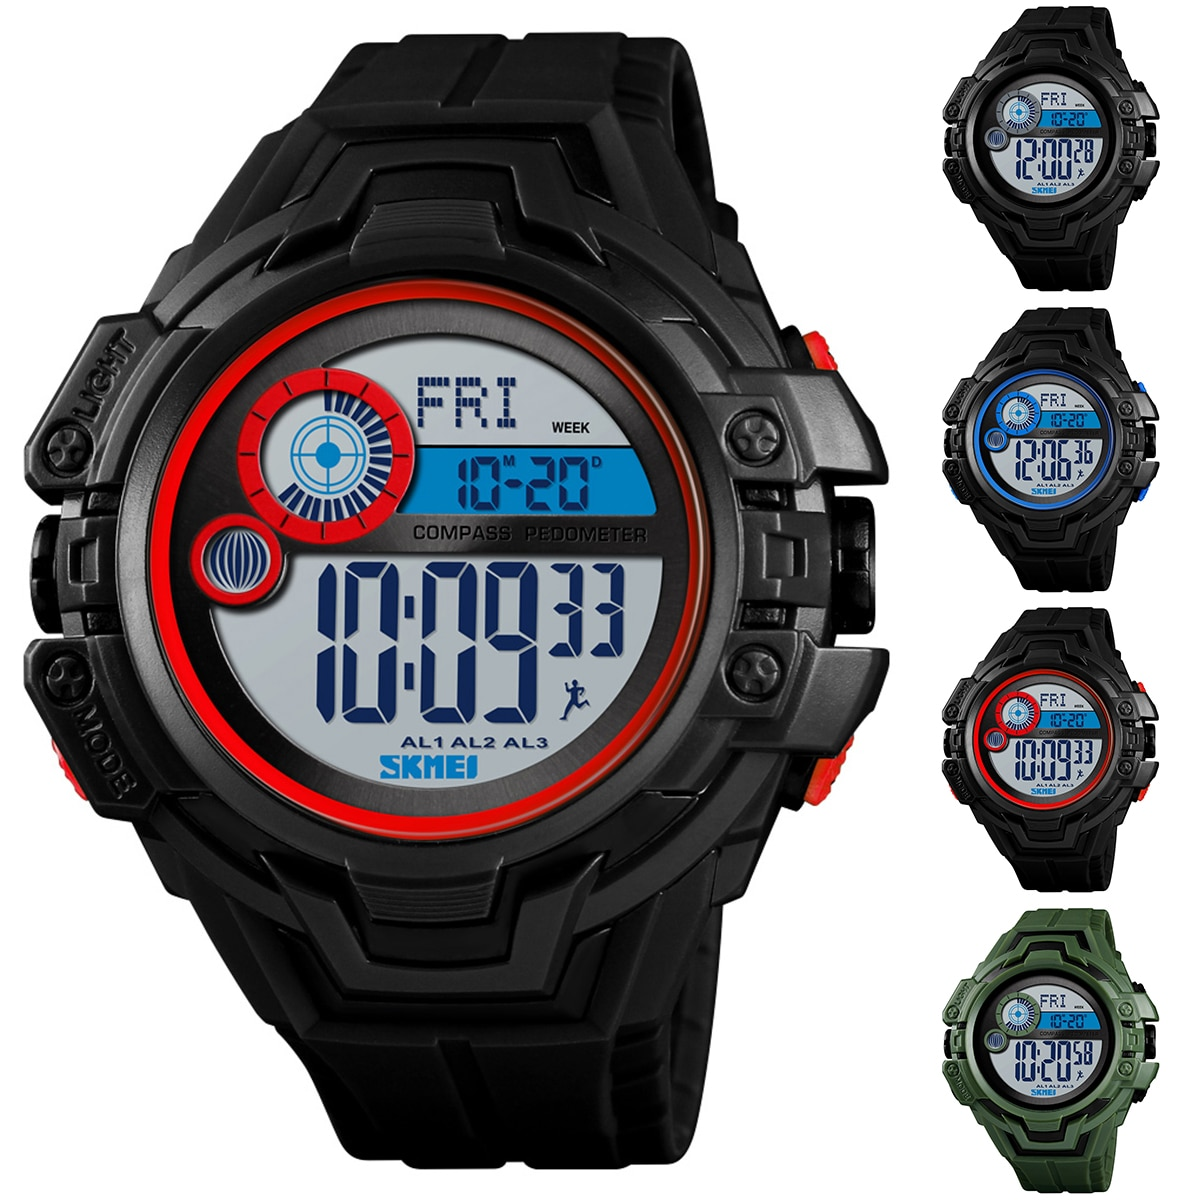 Smart Watch 50M waterproof Multi-function Watch EL light Digital Luminous Countdown Wrist Watch Compass Pedometer Sport Watch